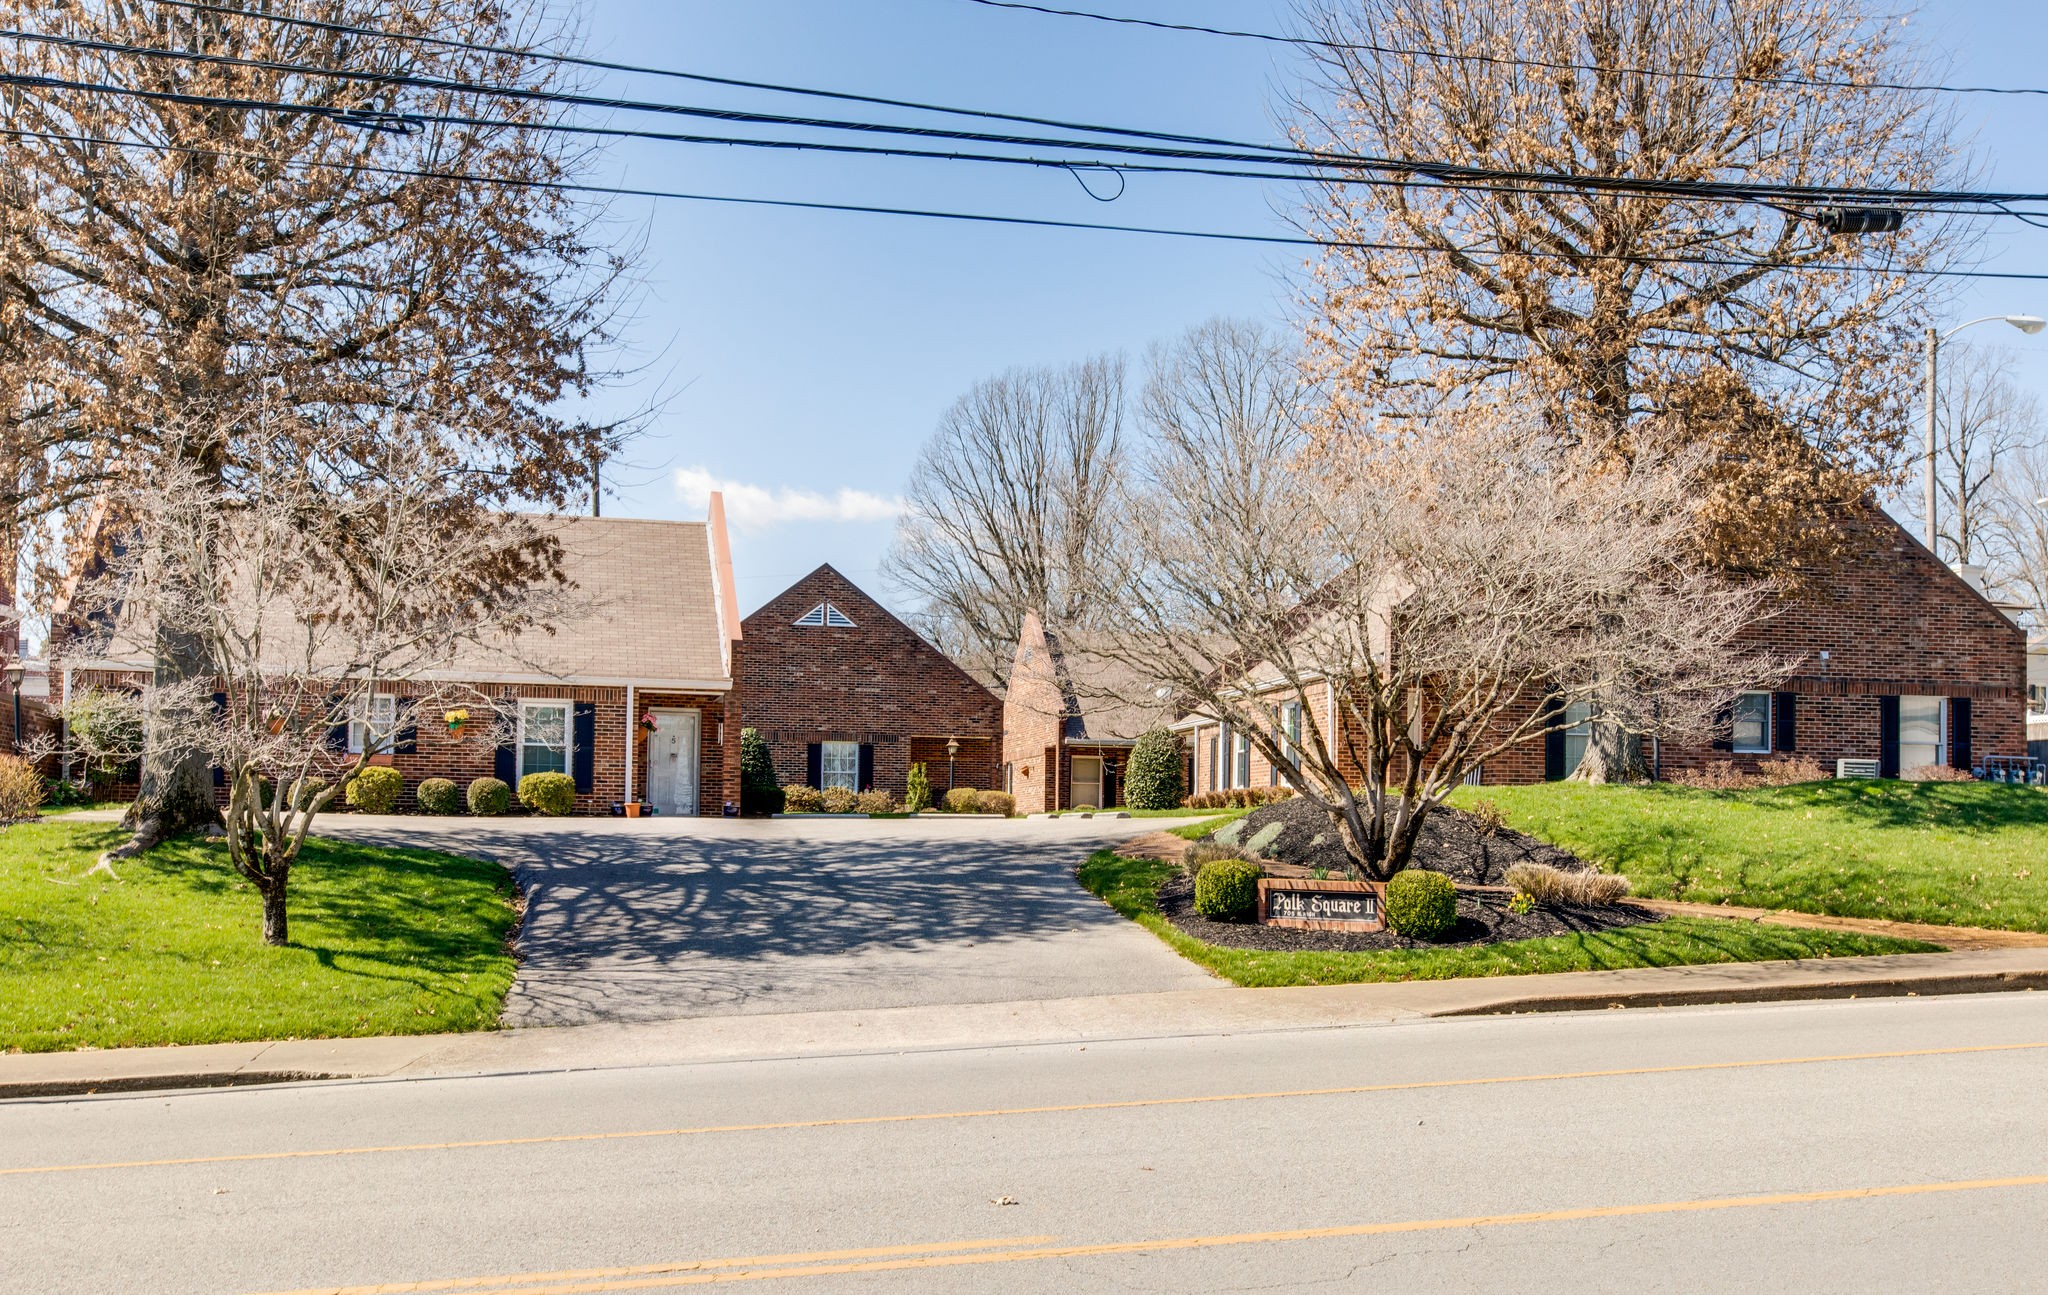 705 N High St, Columbia, TN 38401 - Columbia, TN real estate listing